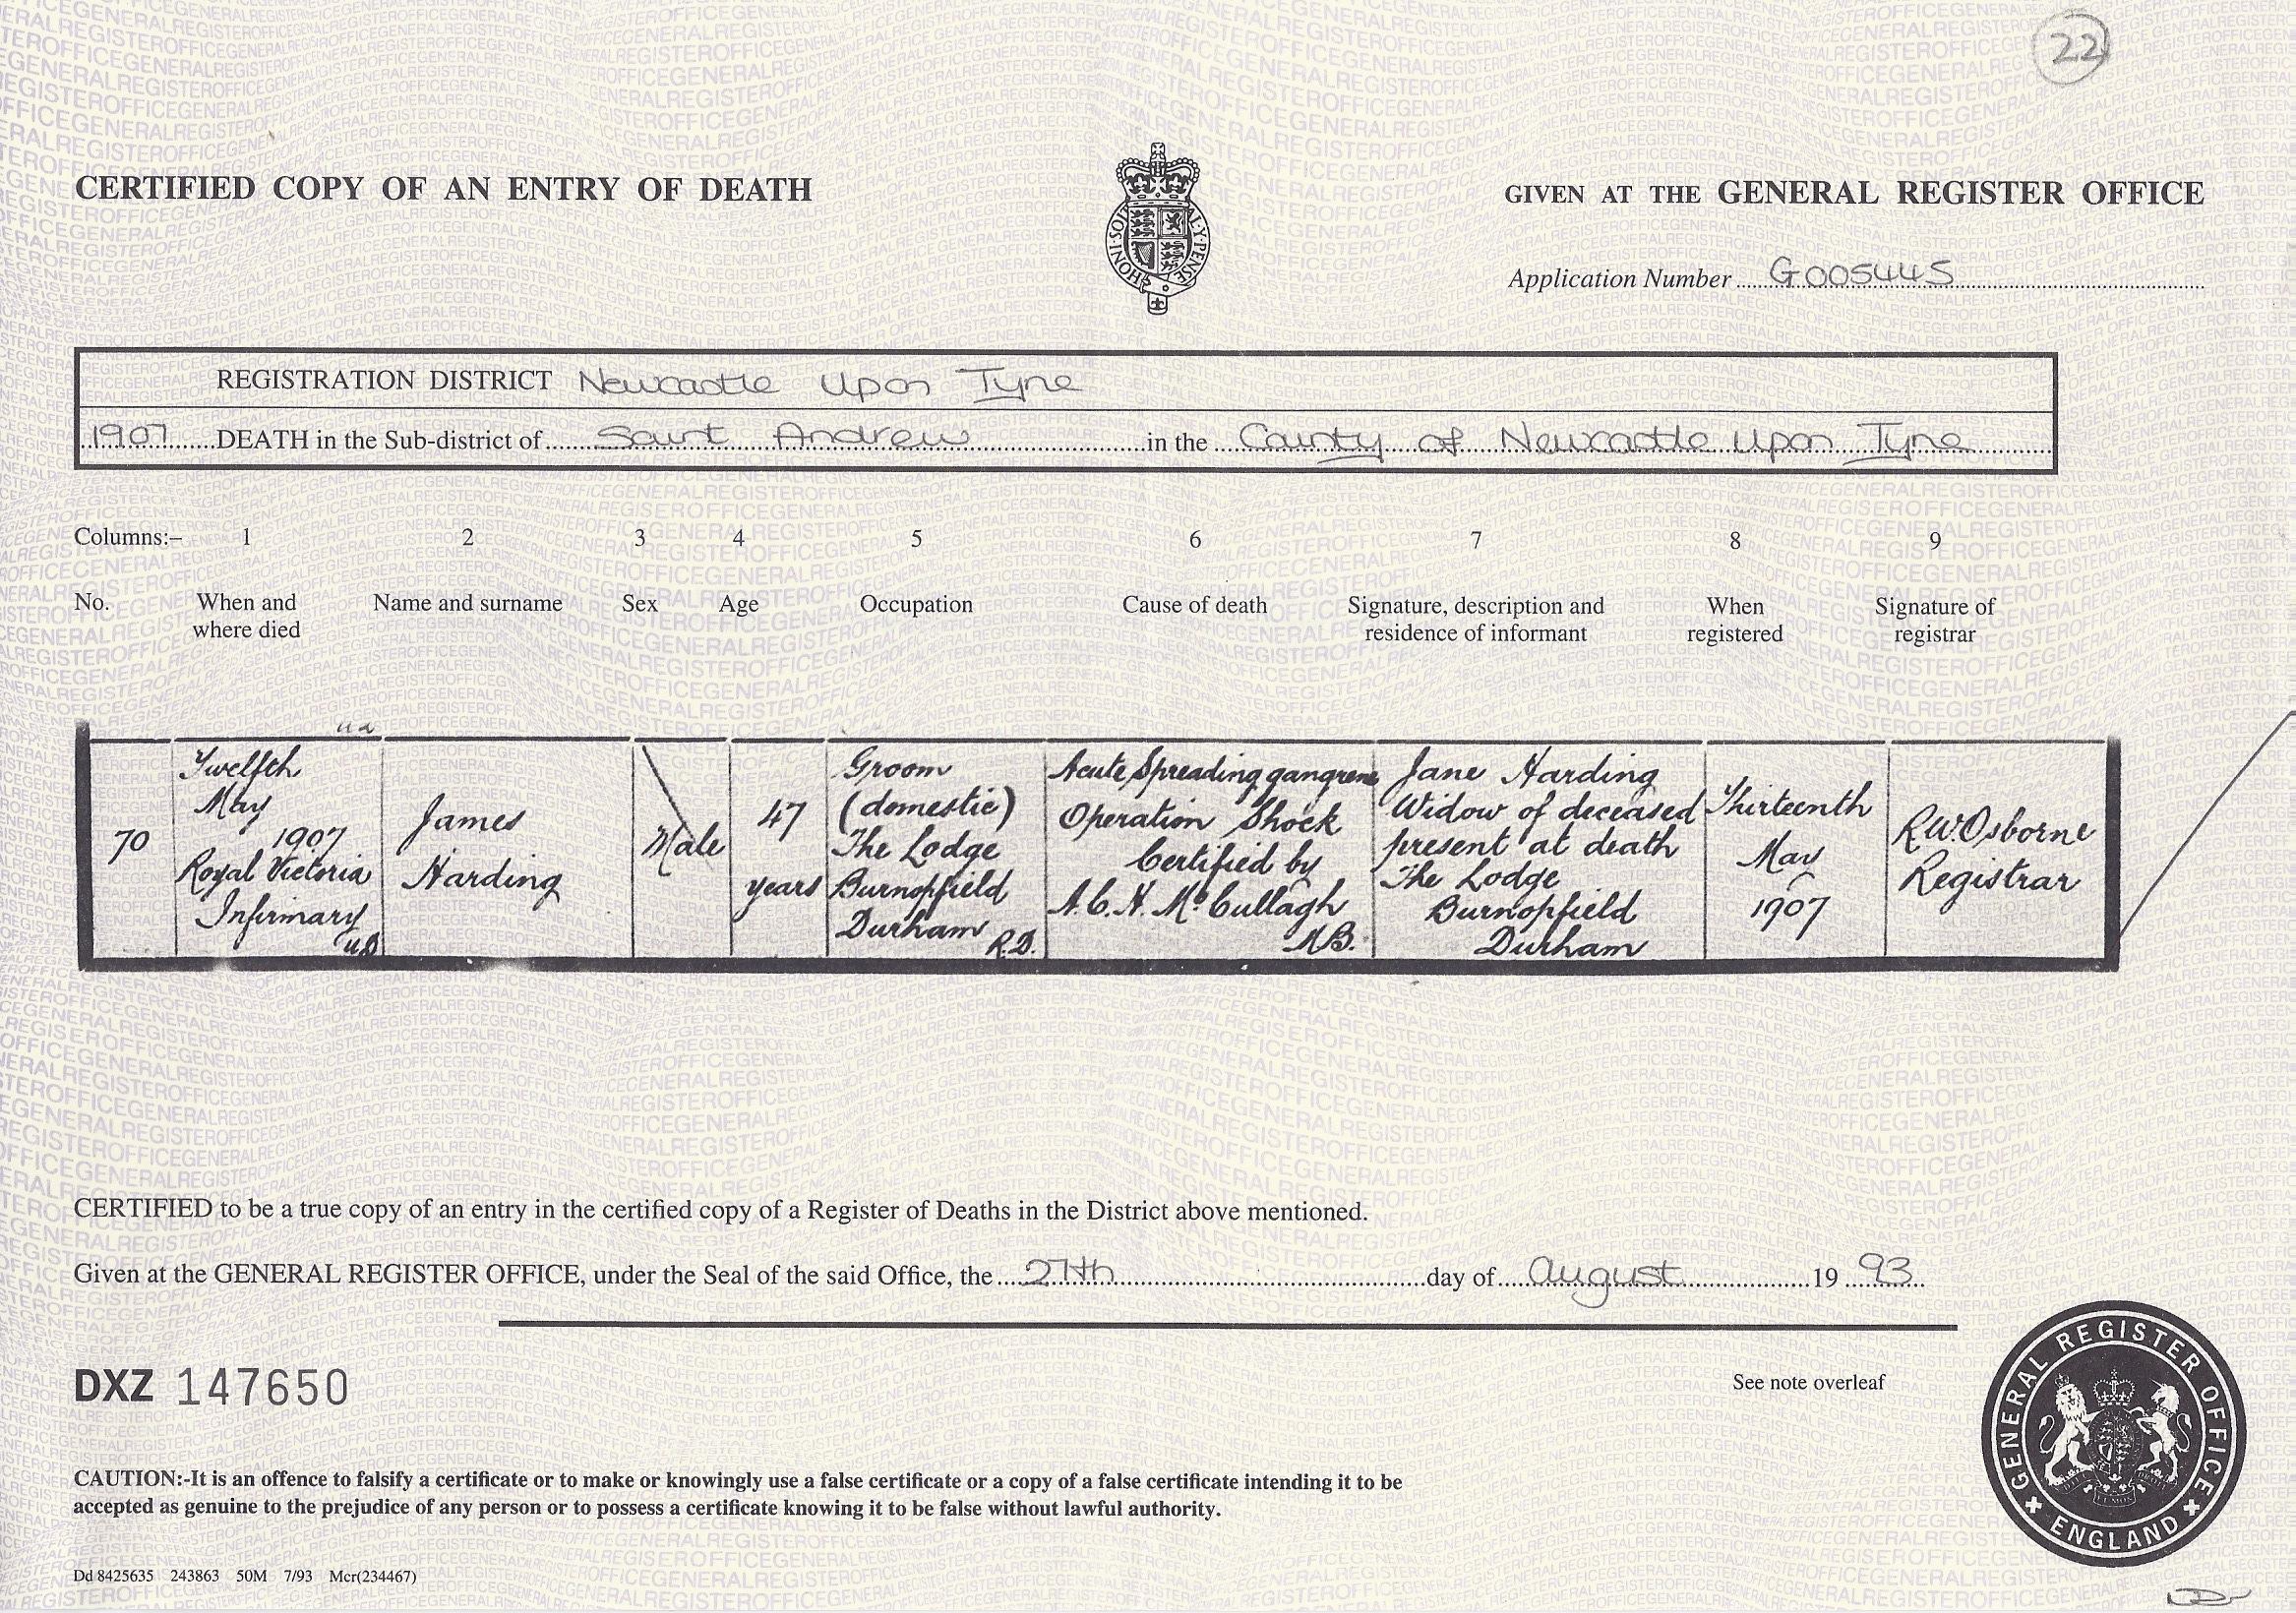 James Harding's Death Certificate